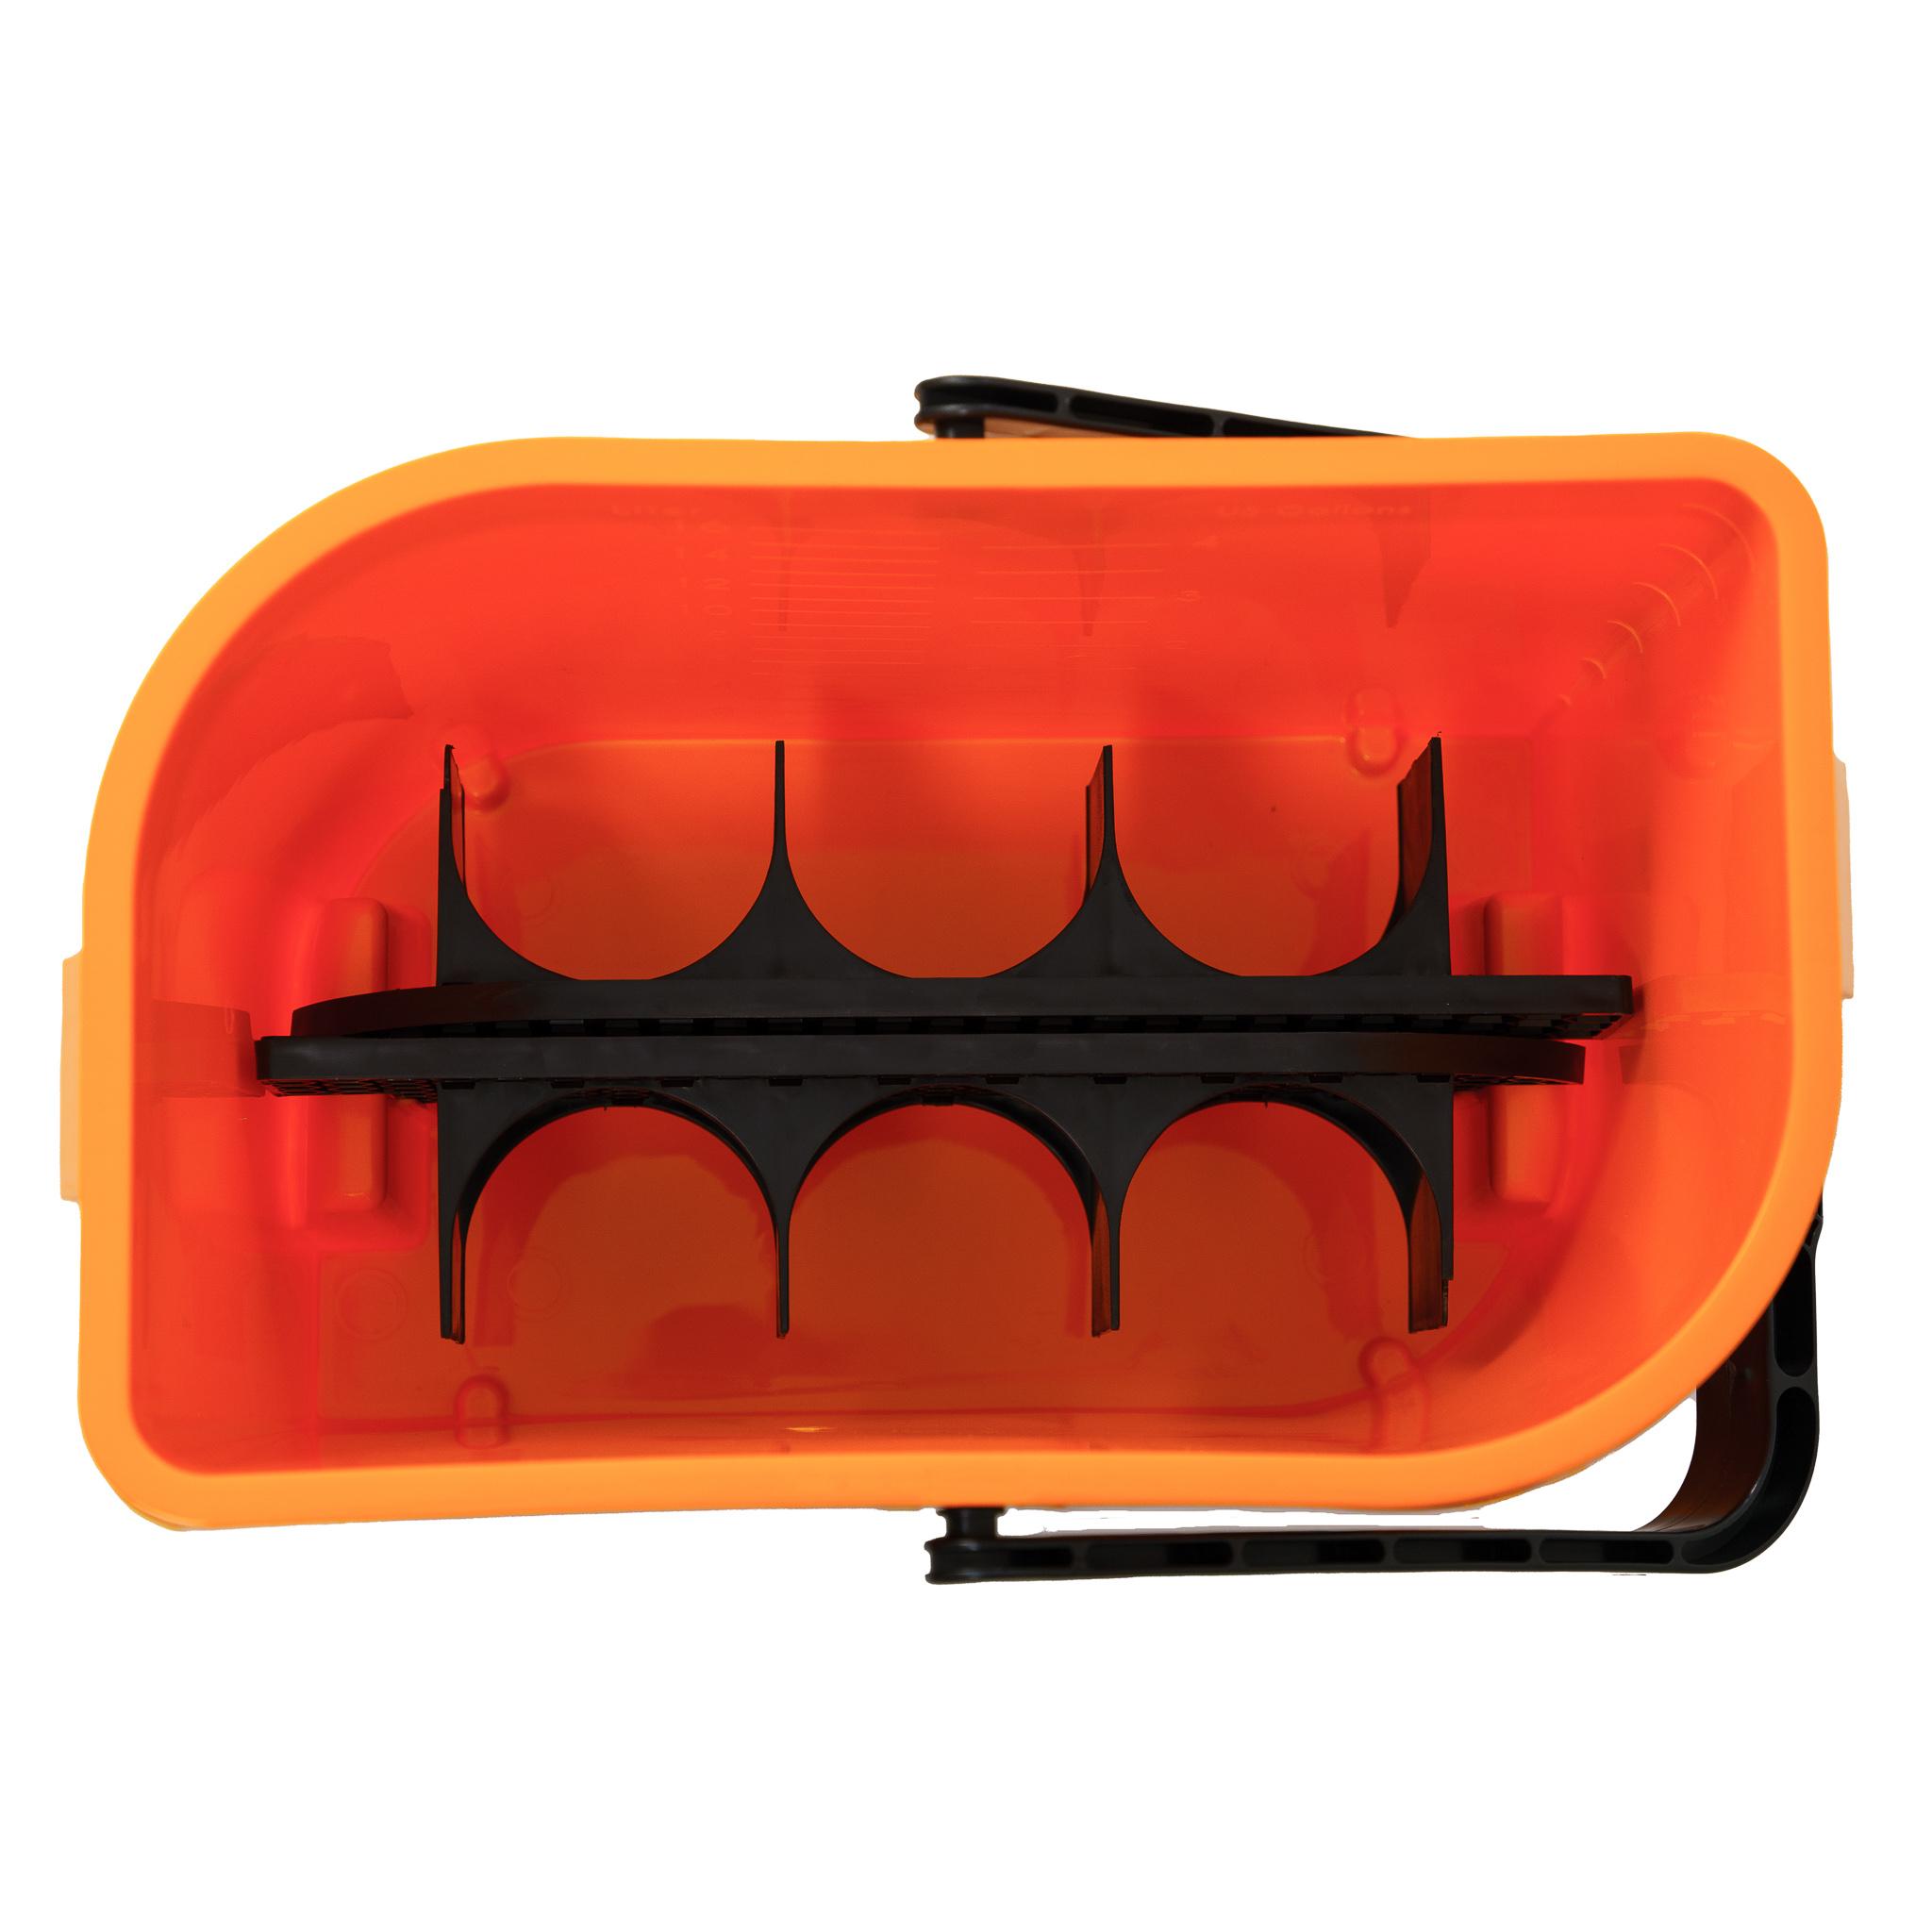 Car Care Bucket orange 2